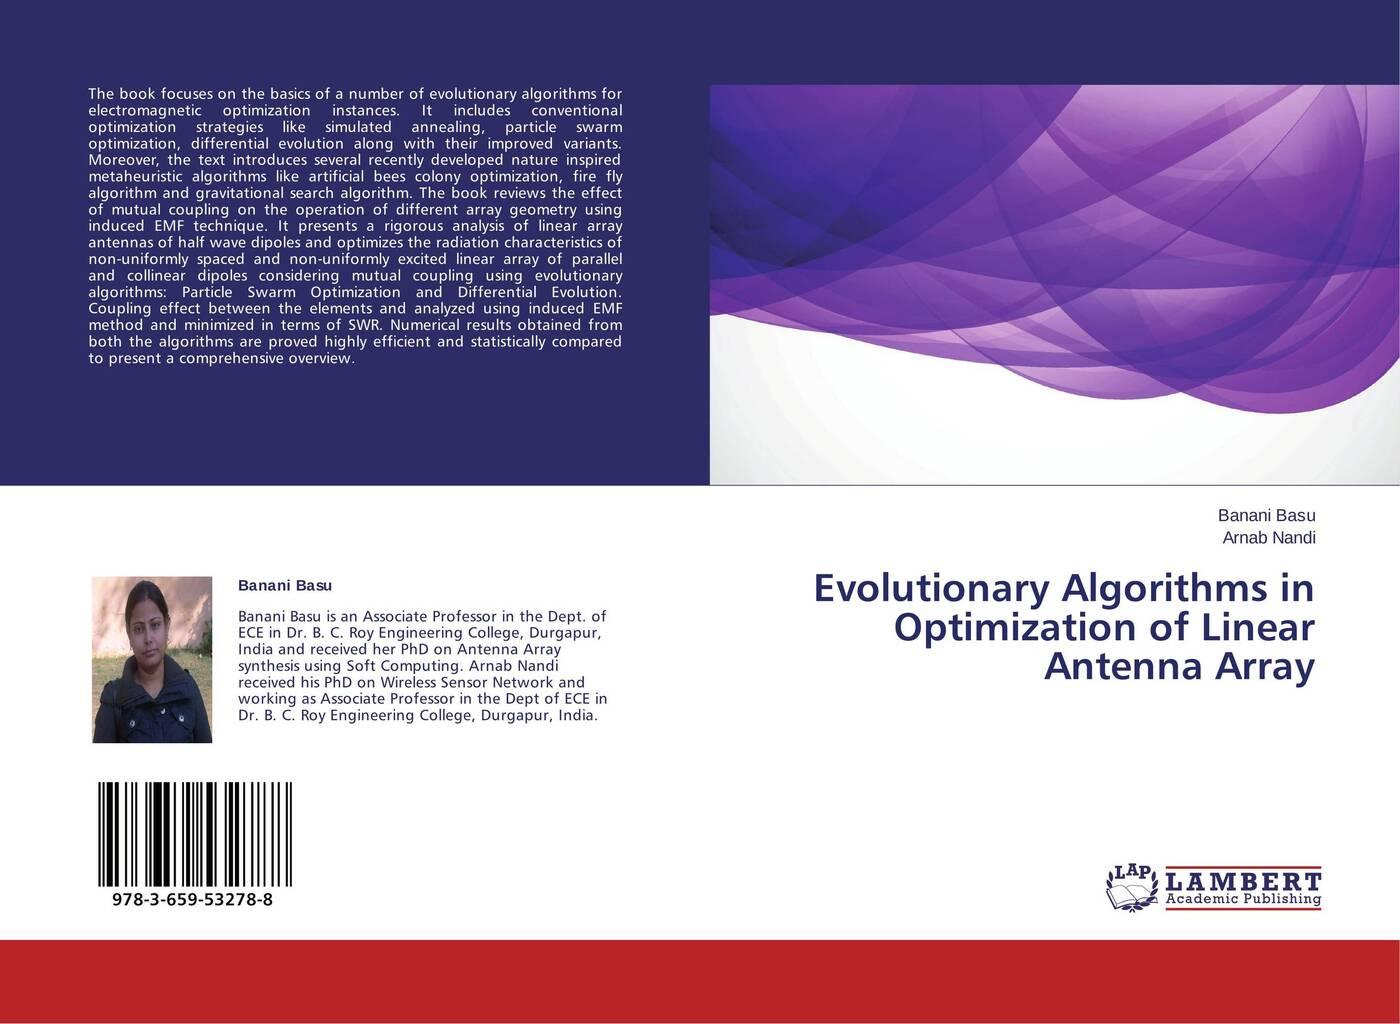 Banani Basu and Arnab Nandi Evolutionary Algorithms in Optimization of Linear Antenna Array application of particle swarm optimization